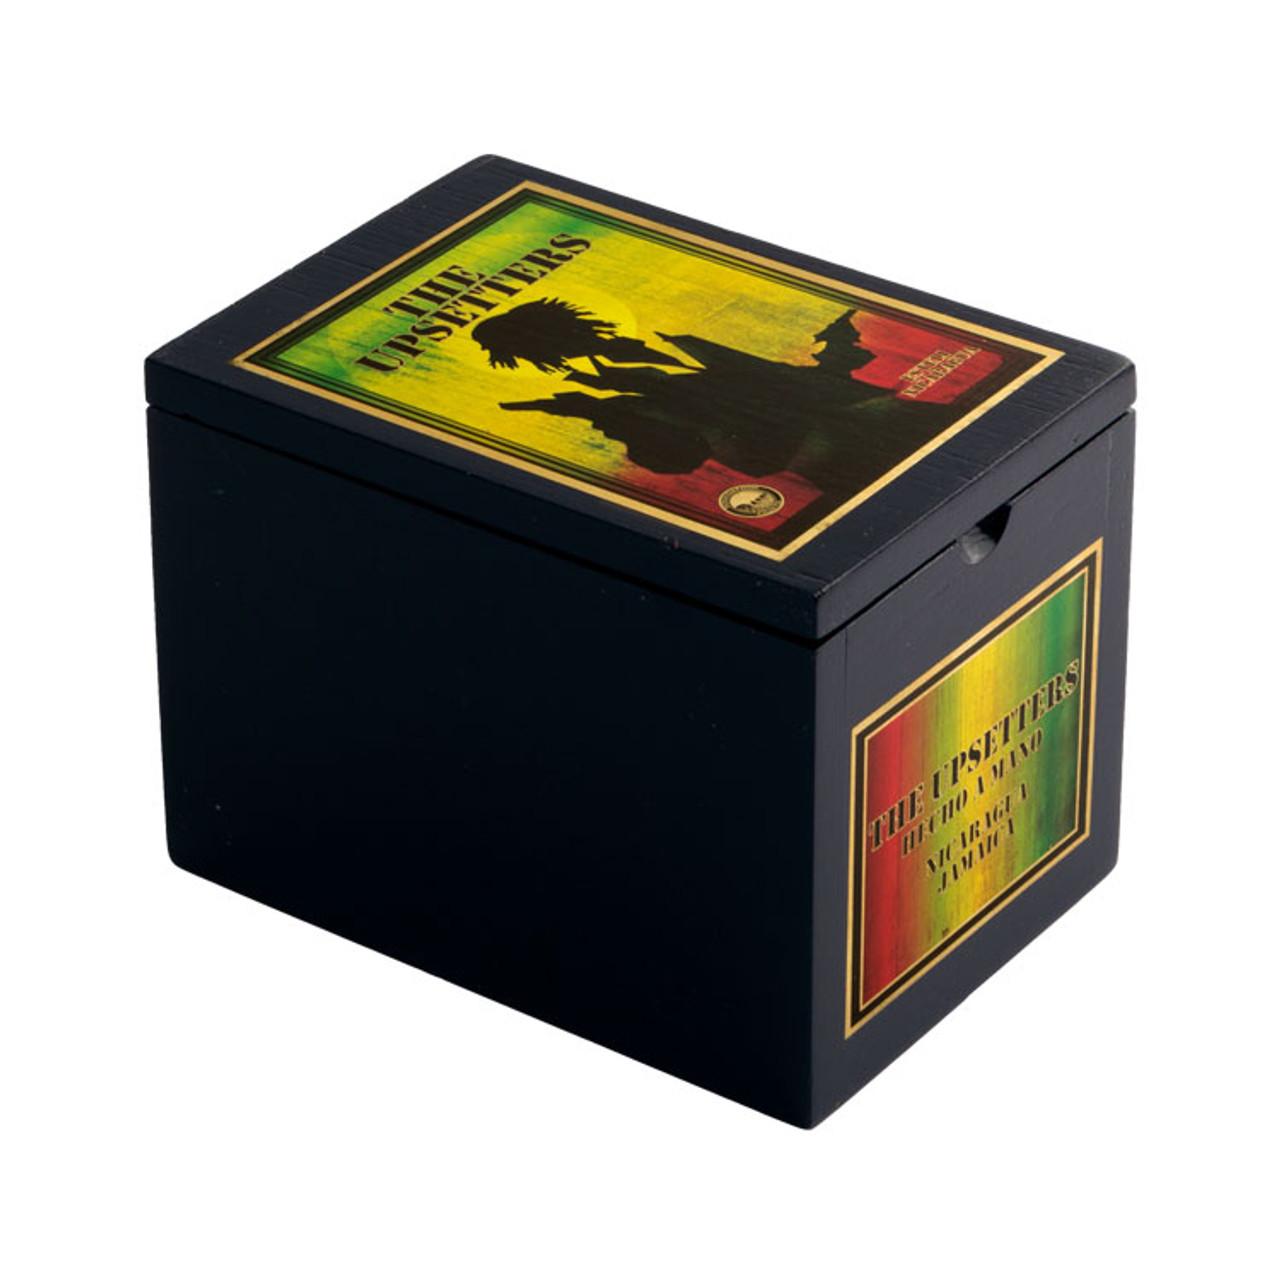 Foundation The Upsetters Django Cigars - 5 x 54 (Box of 20)